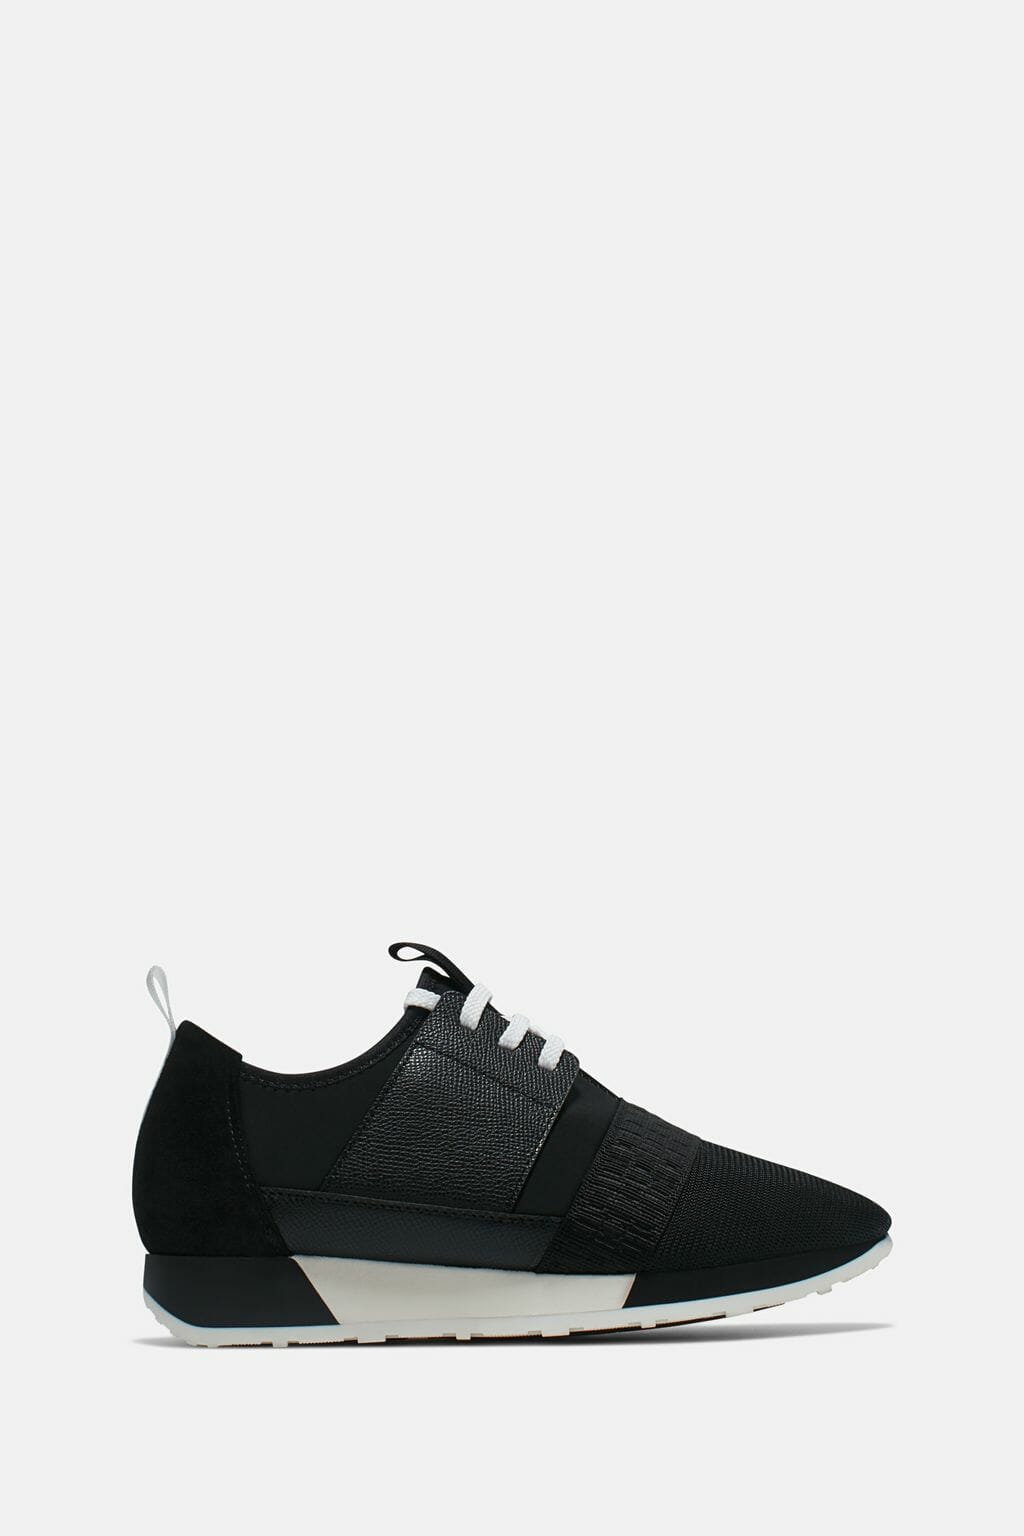 CH-Carolina-herrera-shoes-collection-Spring-Summer-2018-shoe-81